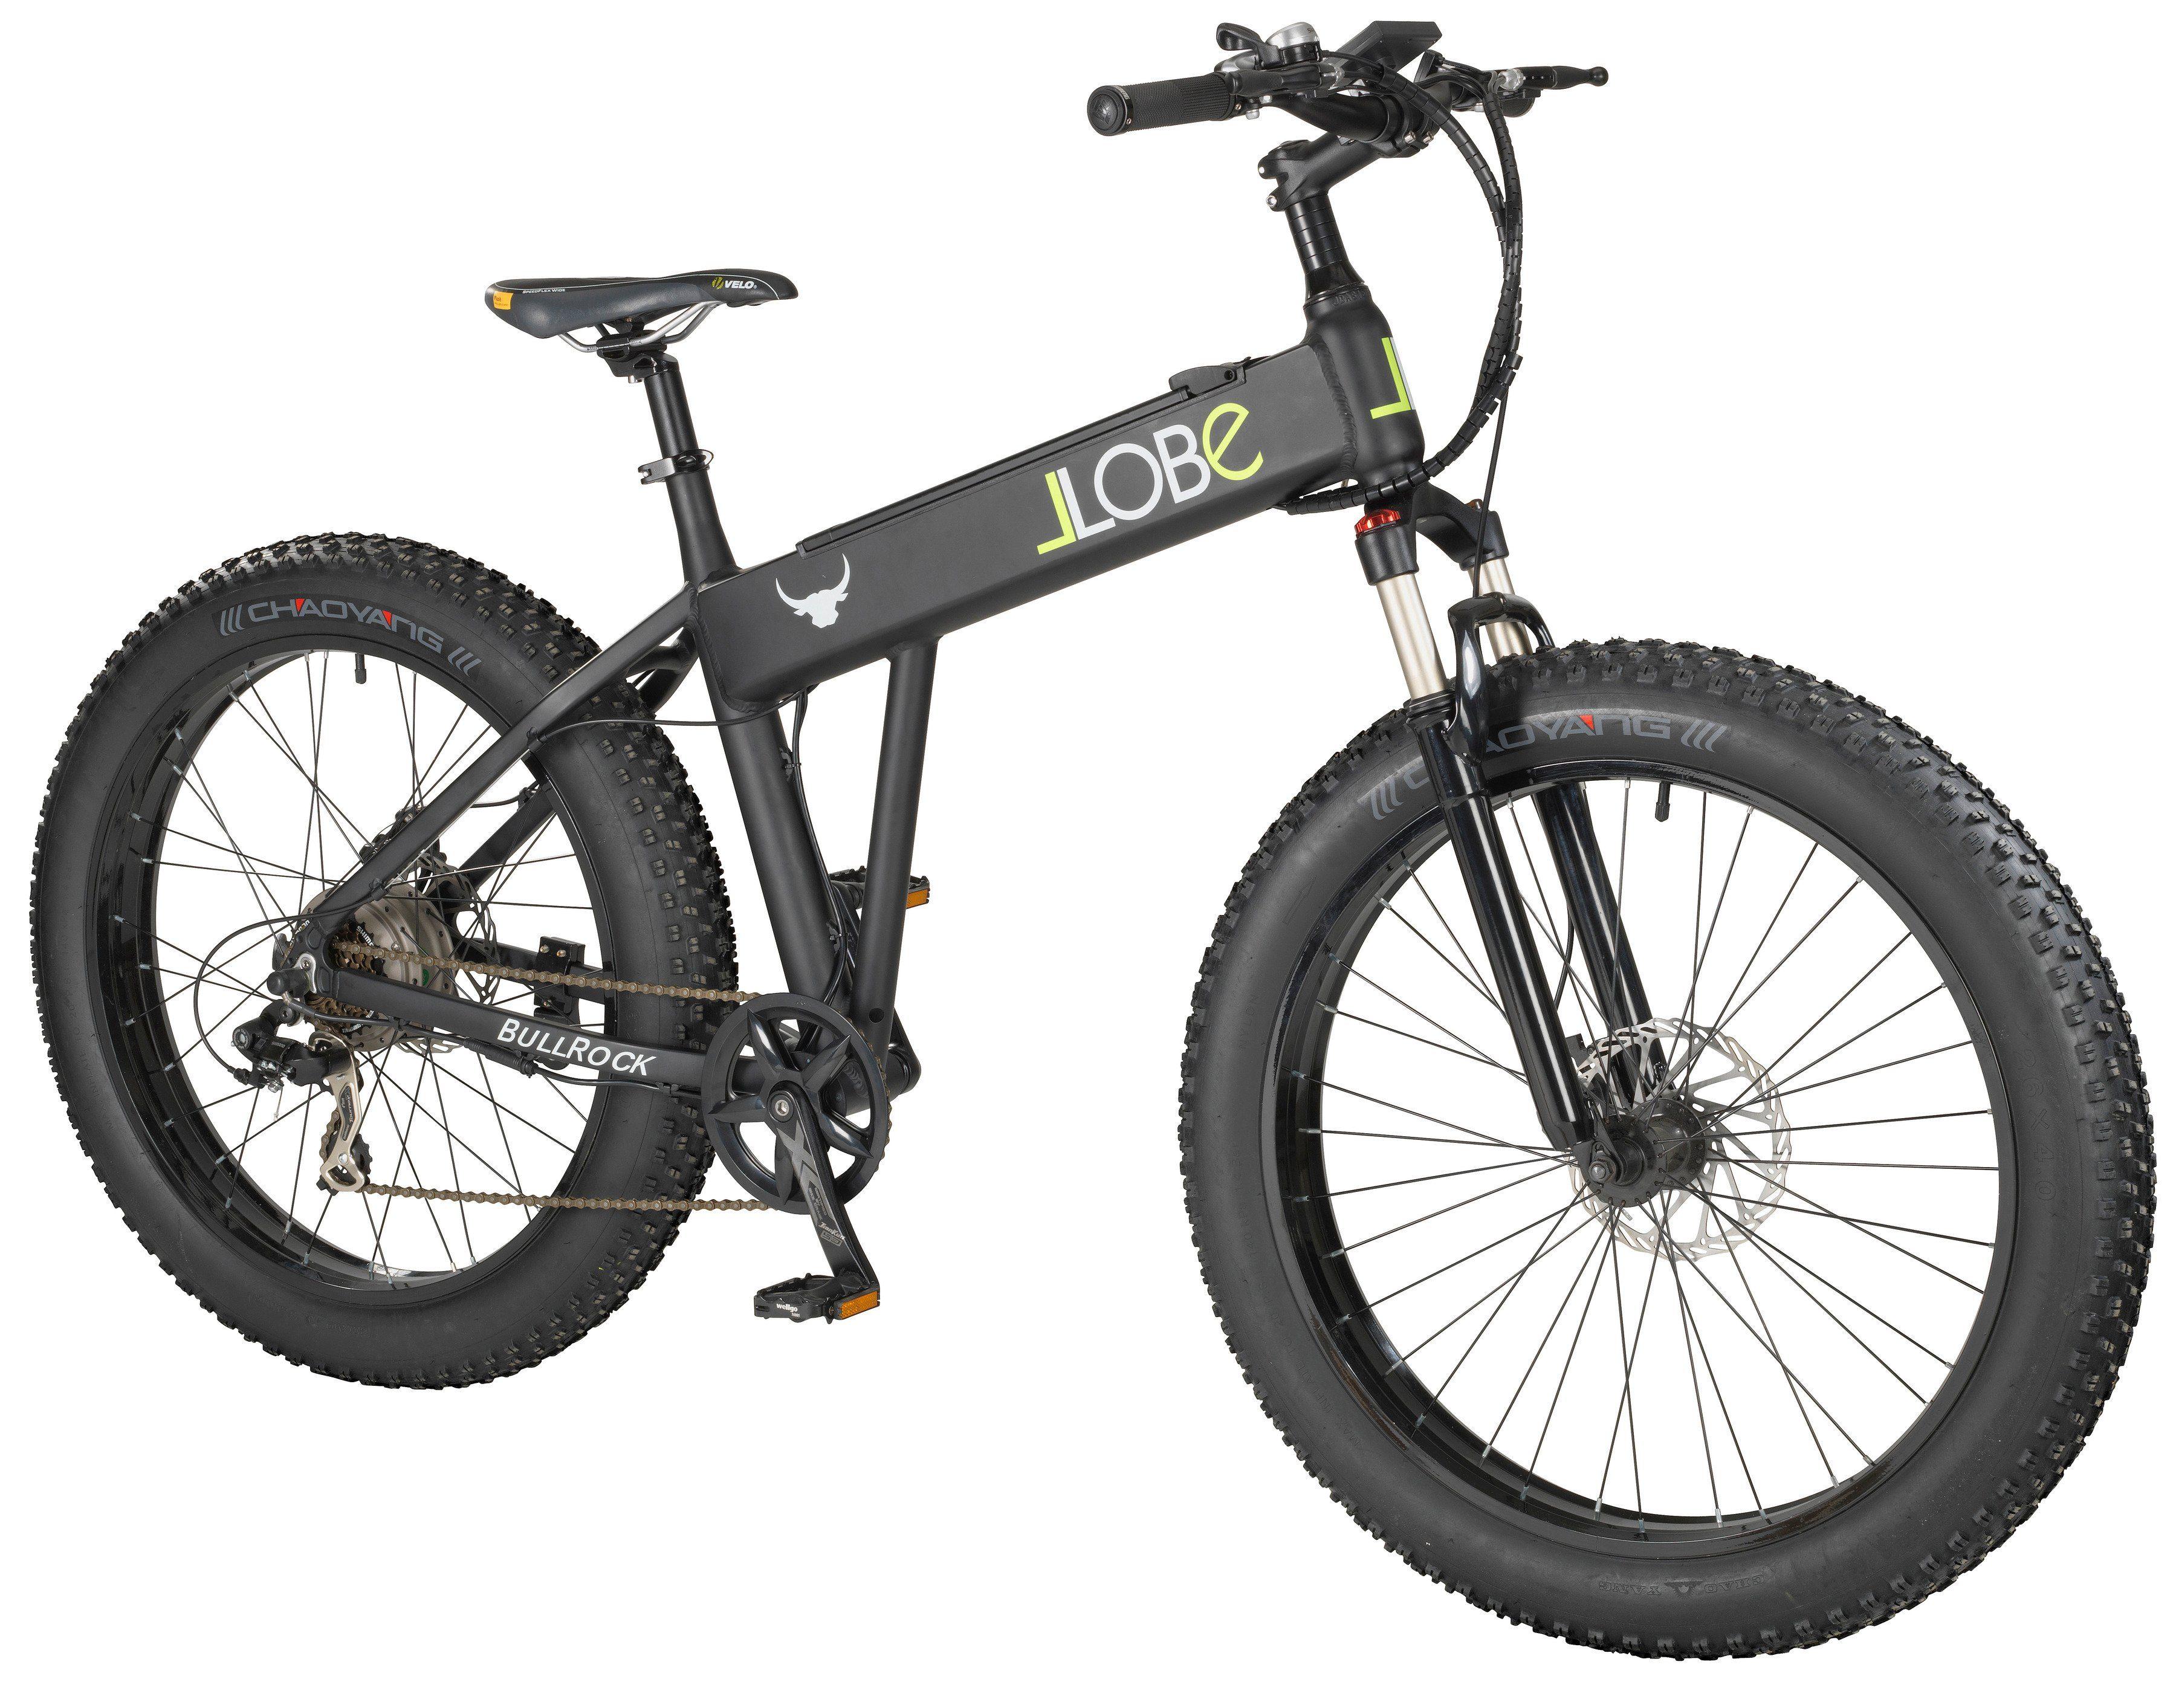 Llobe E-Bike Mountainbike »Bull«, 26 Zoll, 7 Gang, Heckmotor, 374 Wh